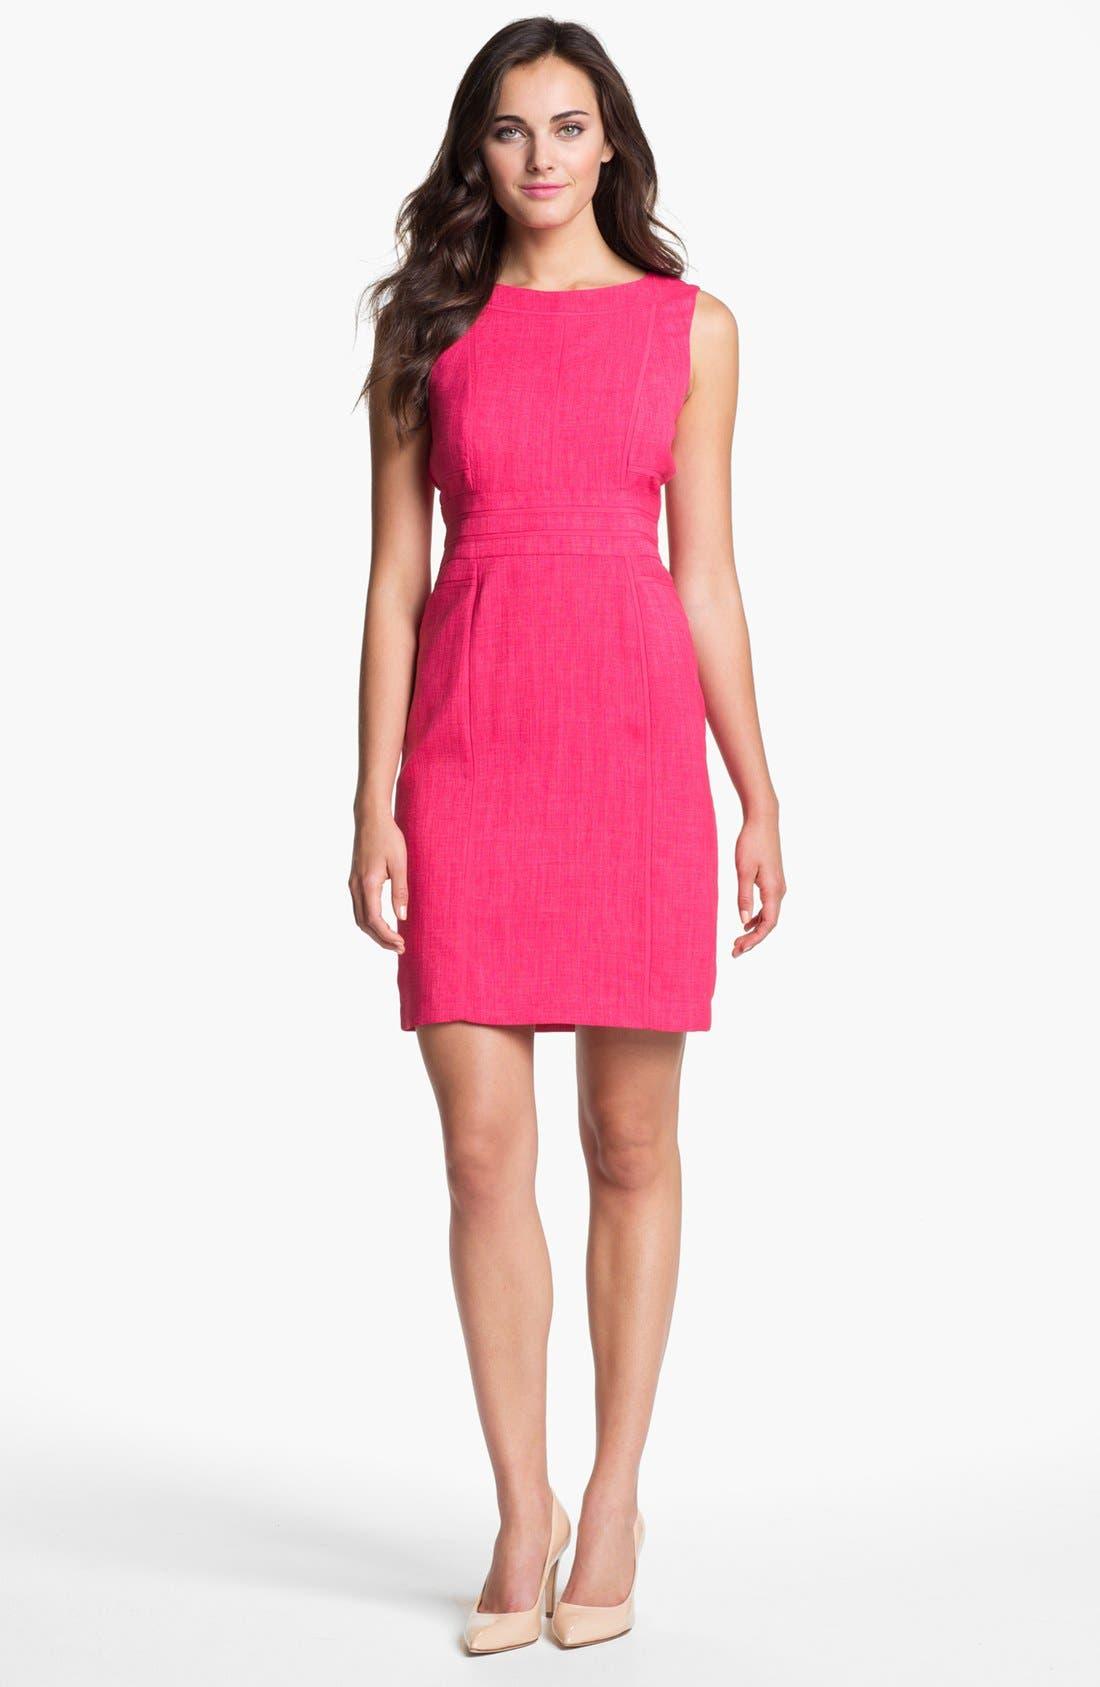 Alternate Image 1 Selected - Ellen Tracy Sleeveless Sheath Dress